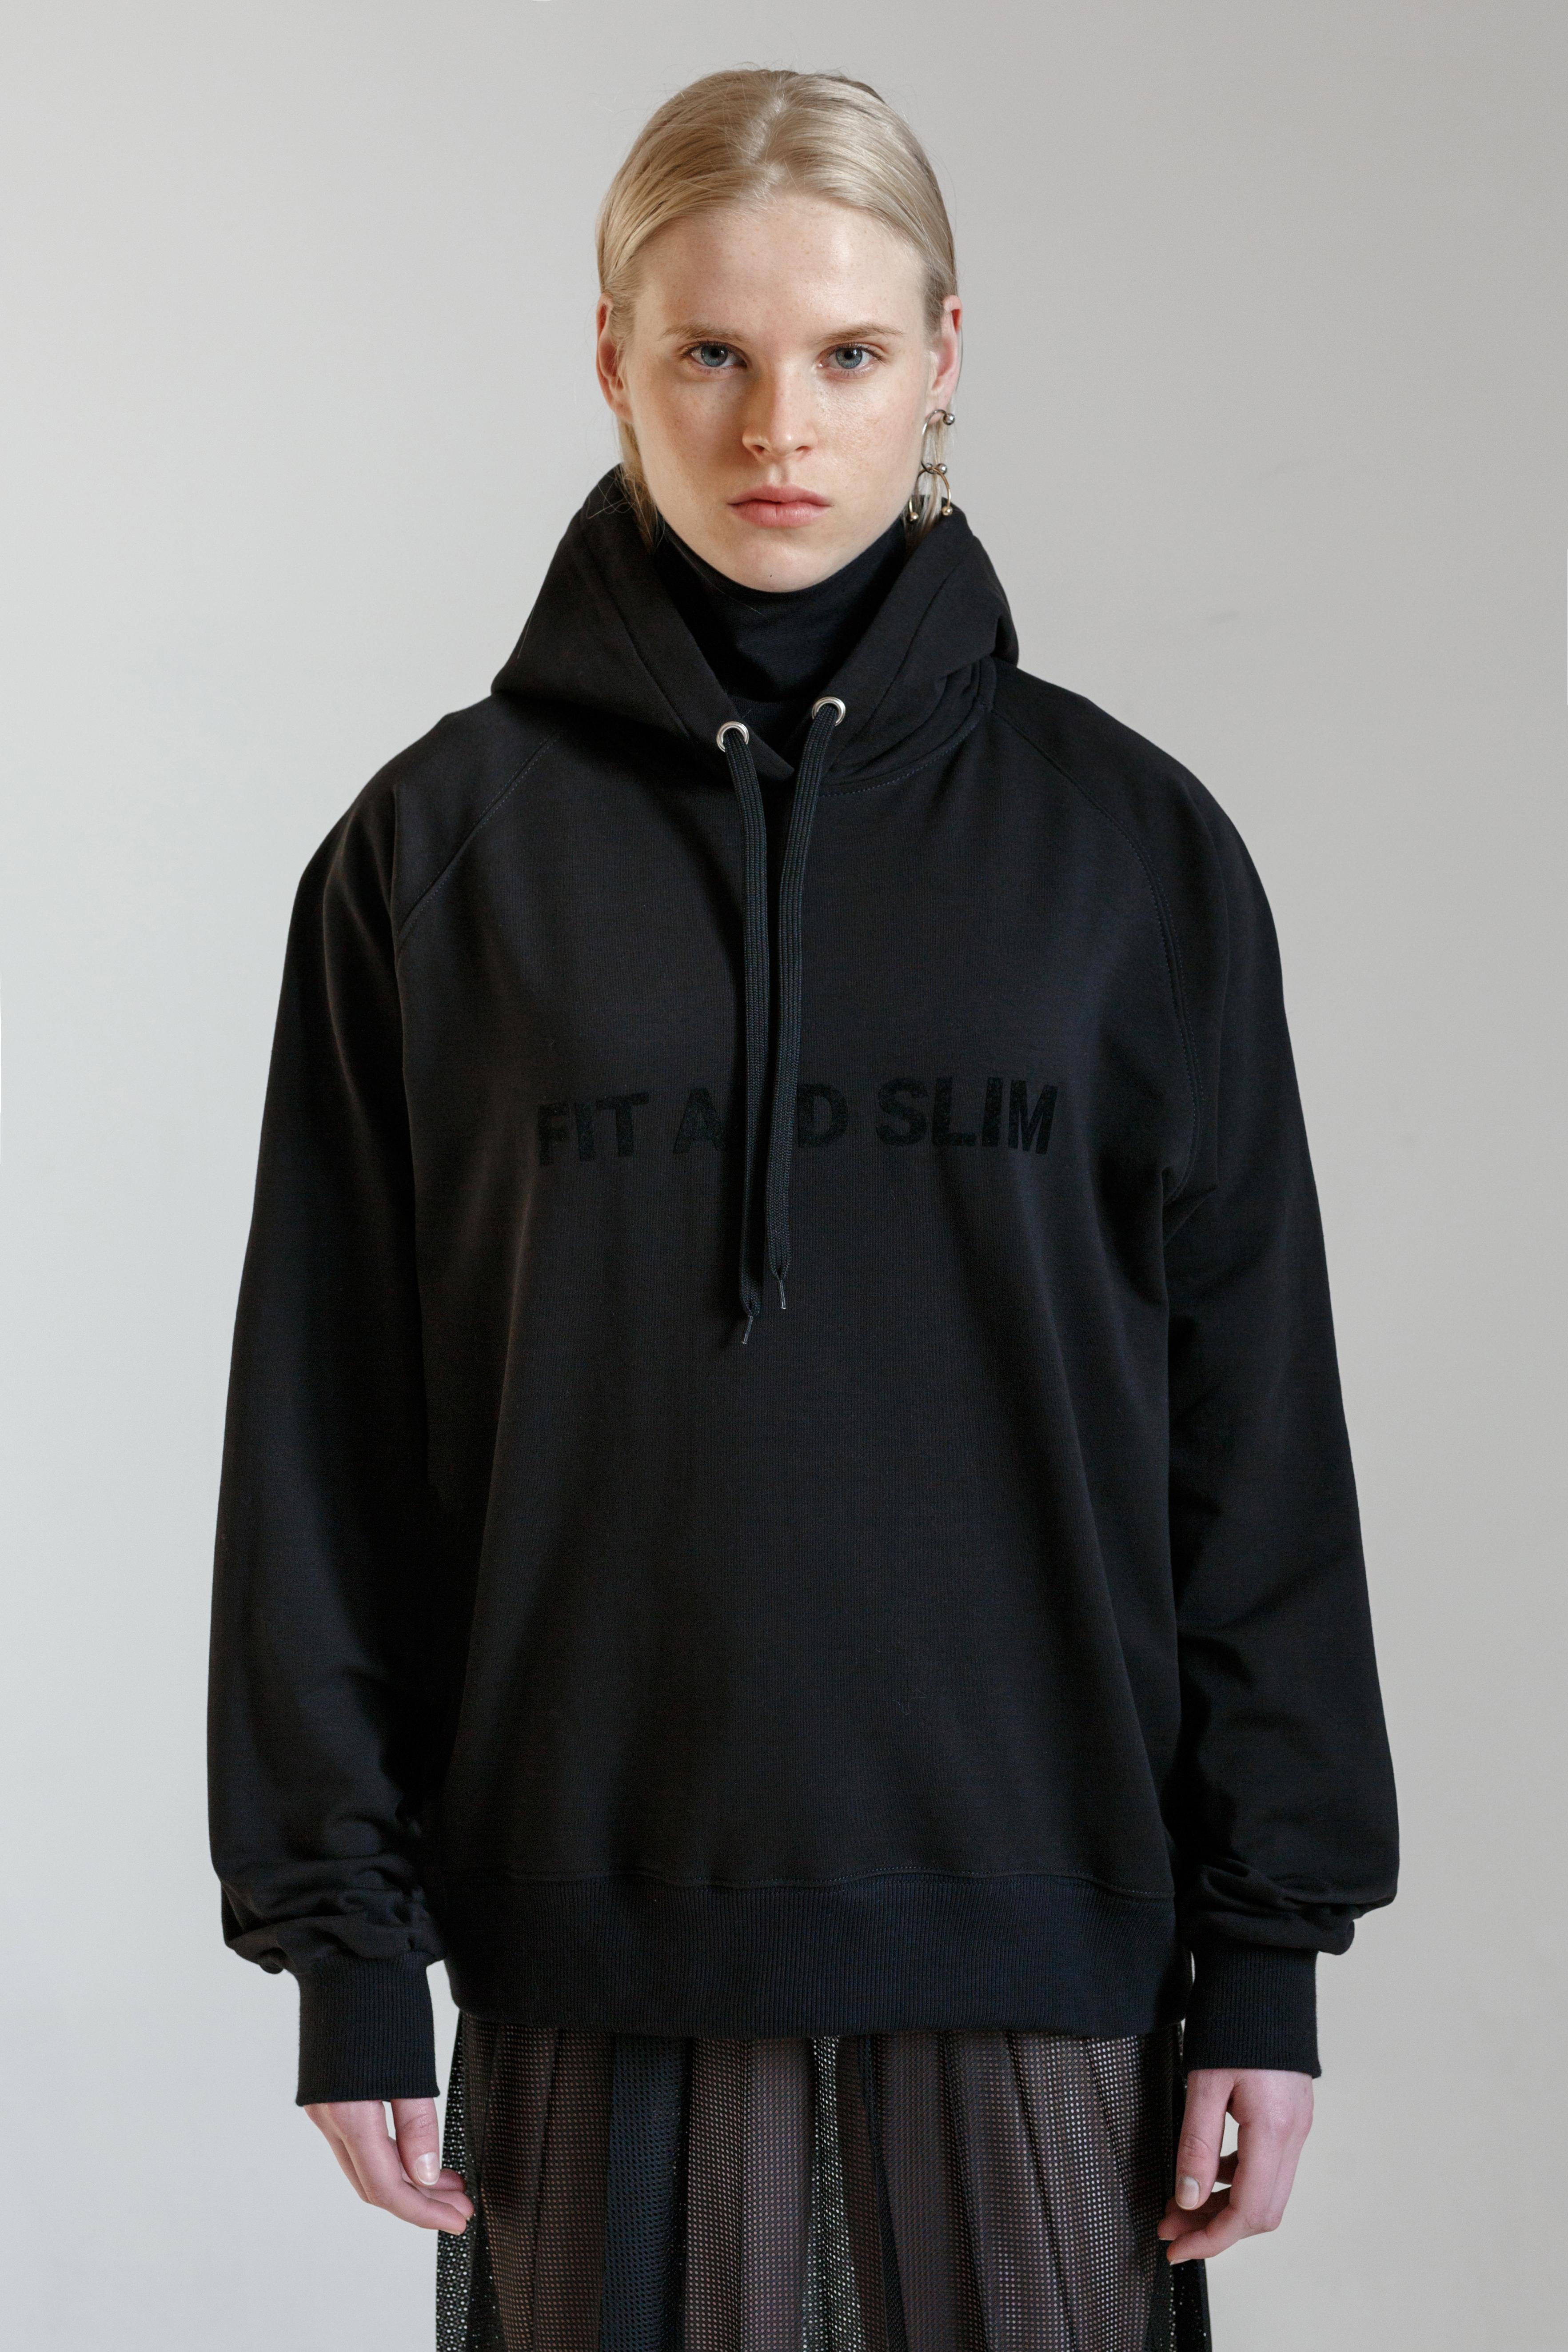 FIT AND SLIM BLACK HOODIE – L A F O R M E L A - SHOP f3cf2dcef30c